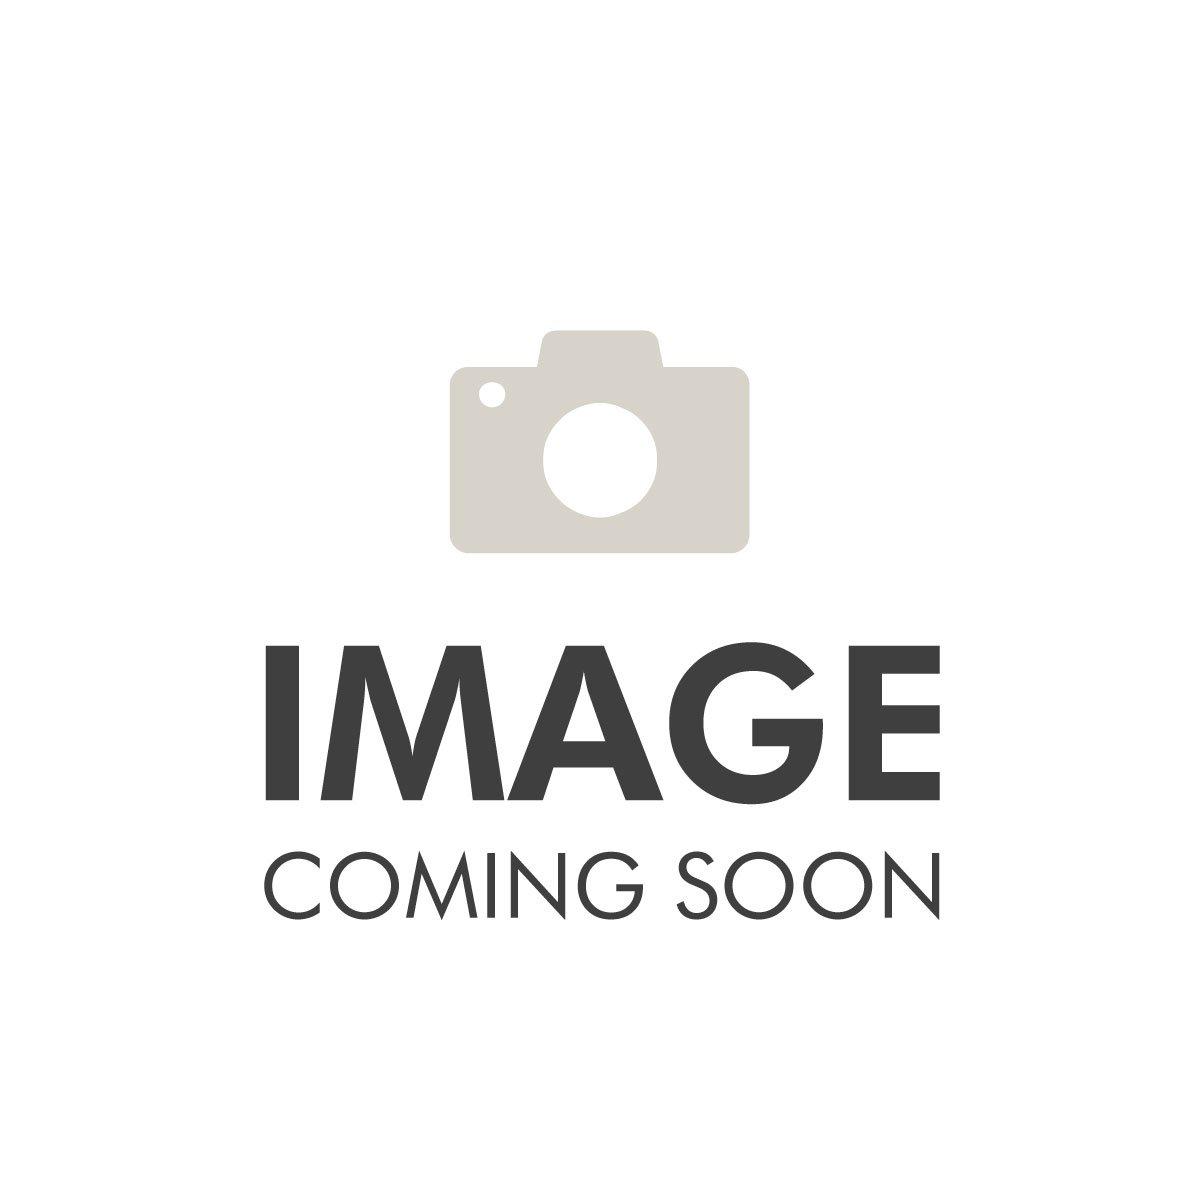 AMD - Foil Point Screws (10-Pack)